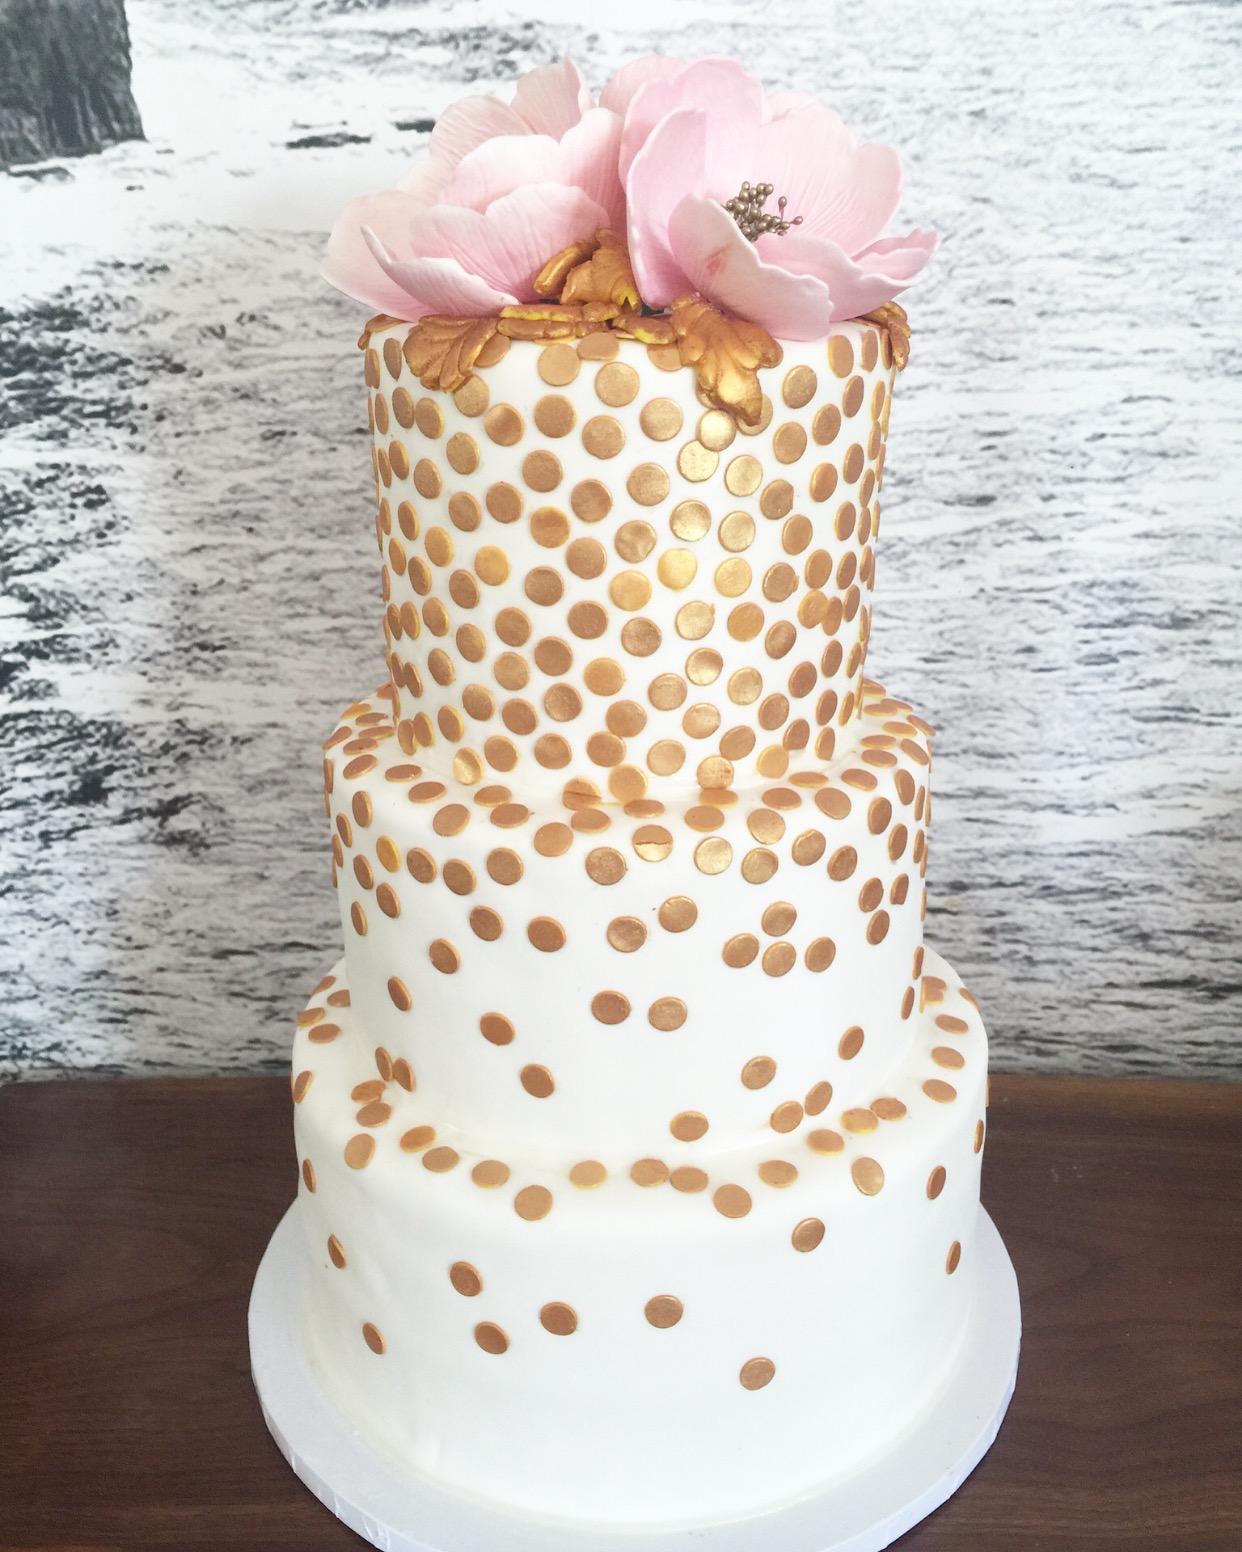 White wedding cake with gold confetti sparkle